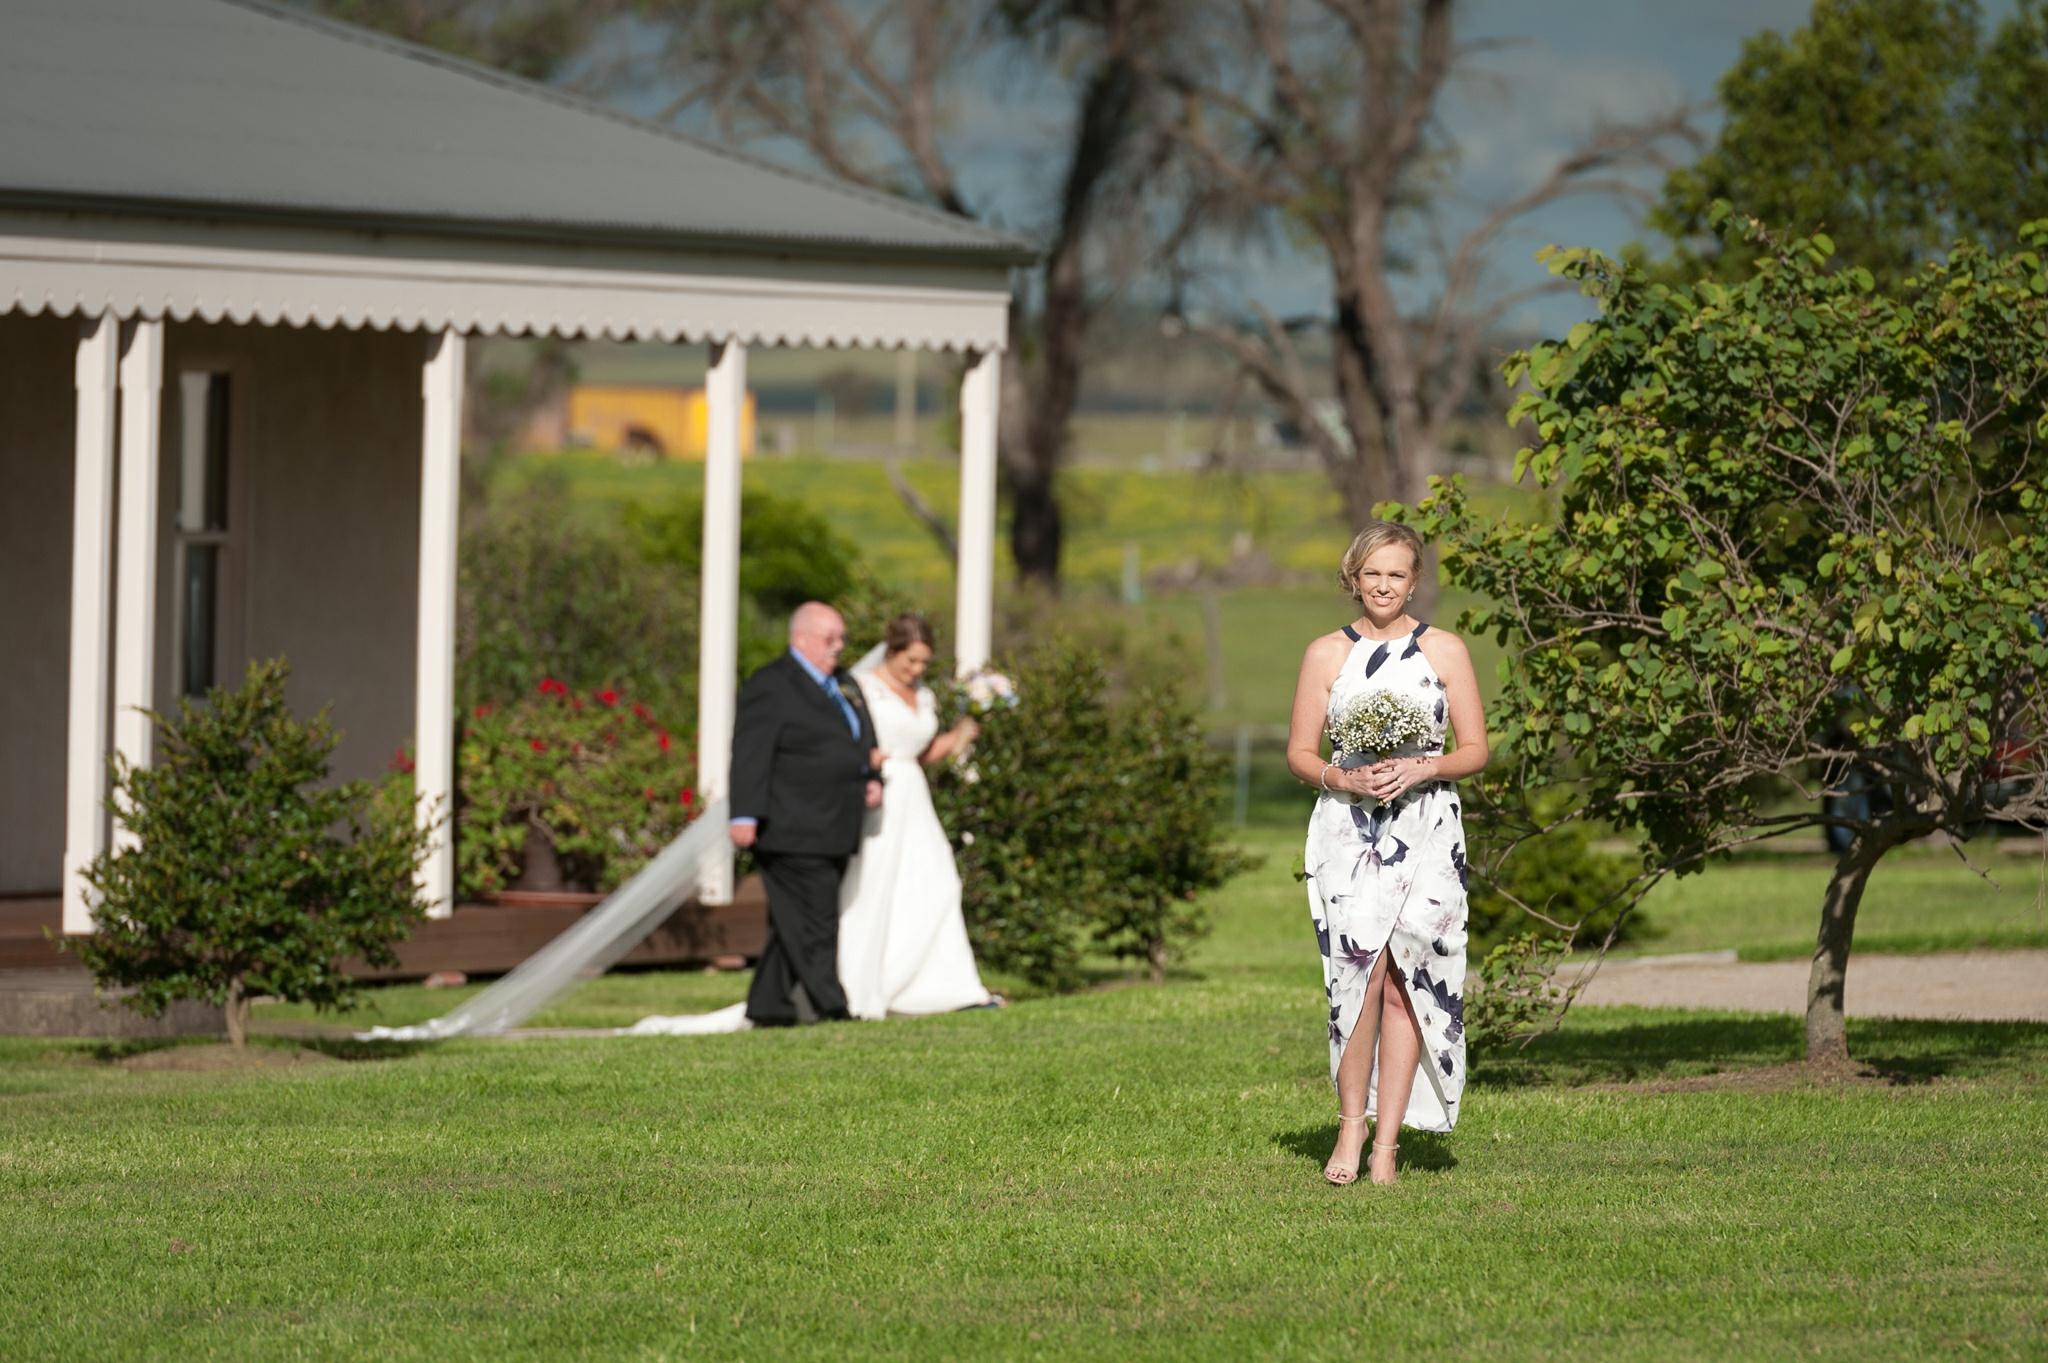 wedding_Andrew-&-Kim_0016.jpg